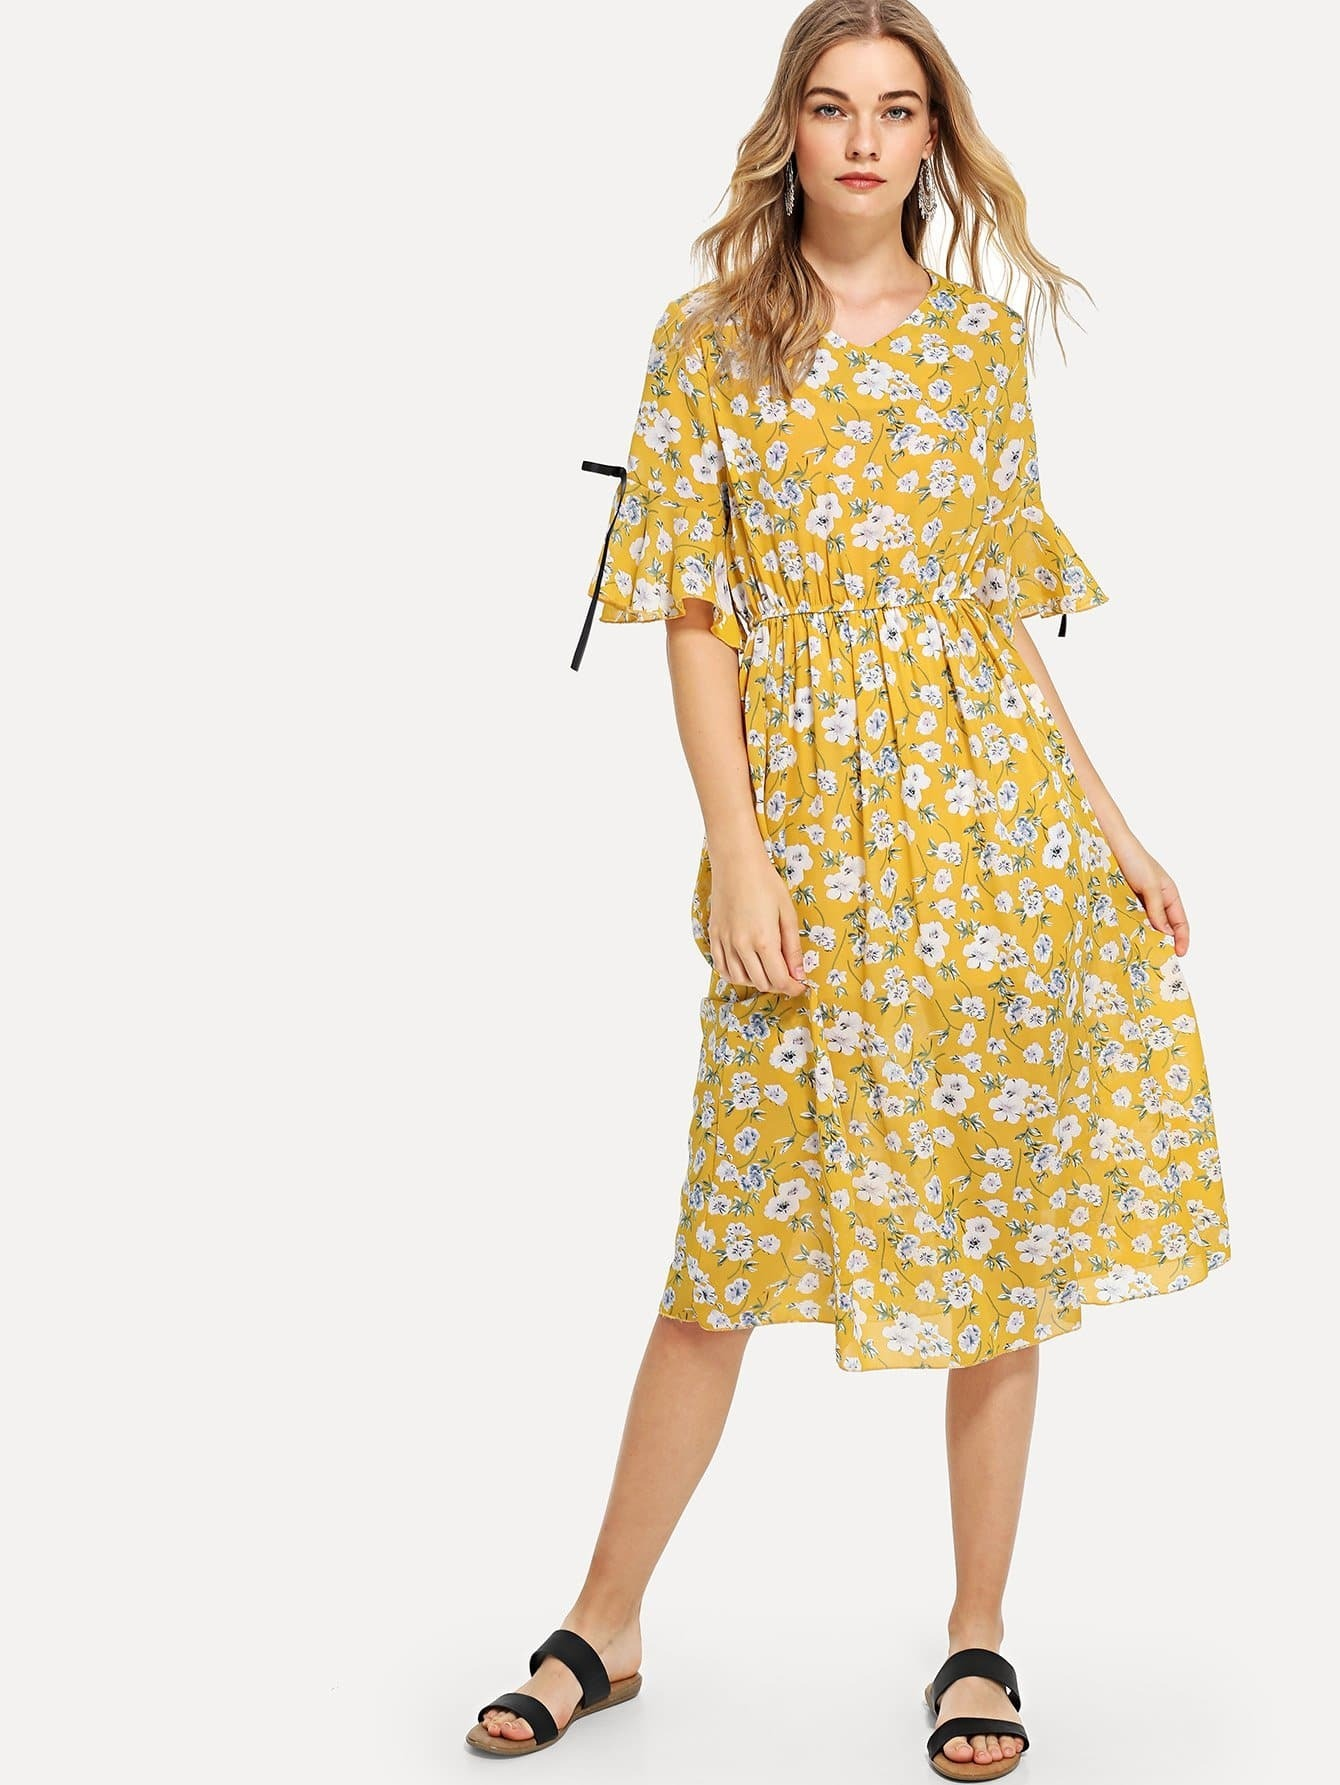 Ditsy Print Bow Detail Dress off shoulder ditsy dress